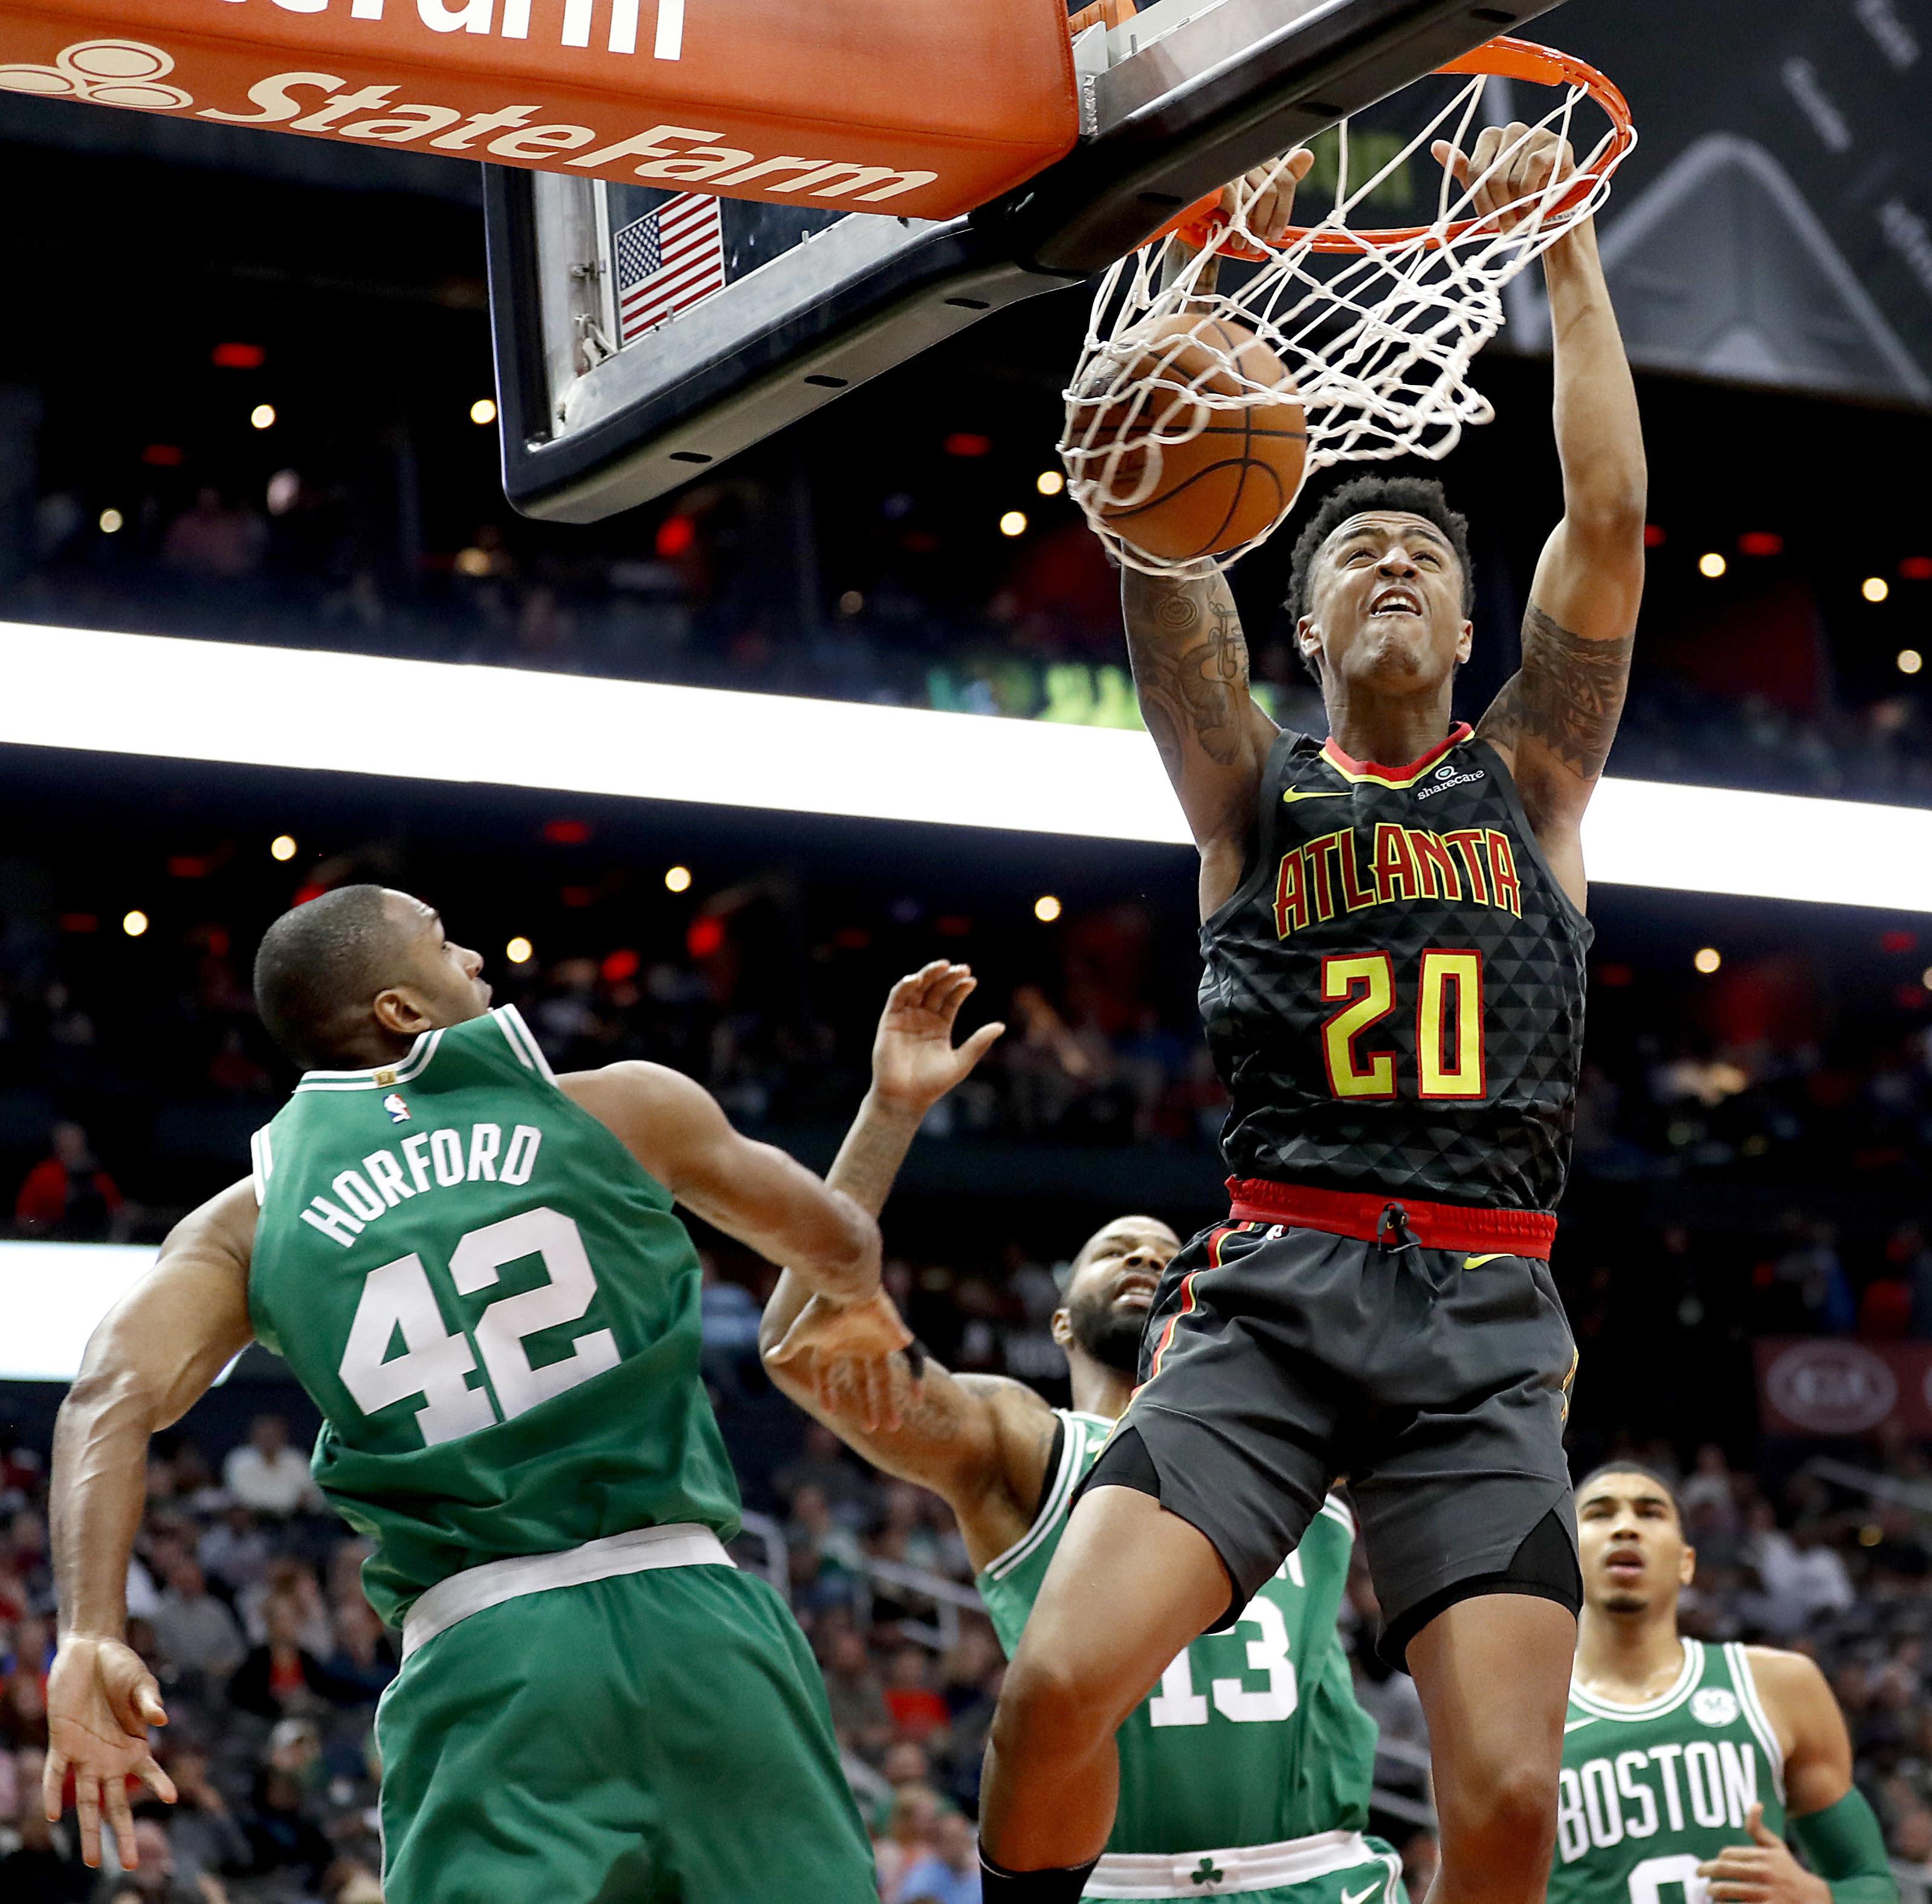 Sources: Hawks Rookie John Collins To Miss 2 To 3 Weeks